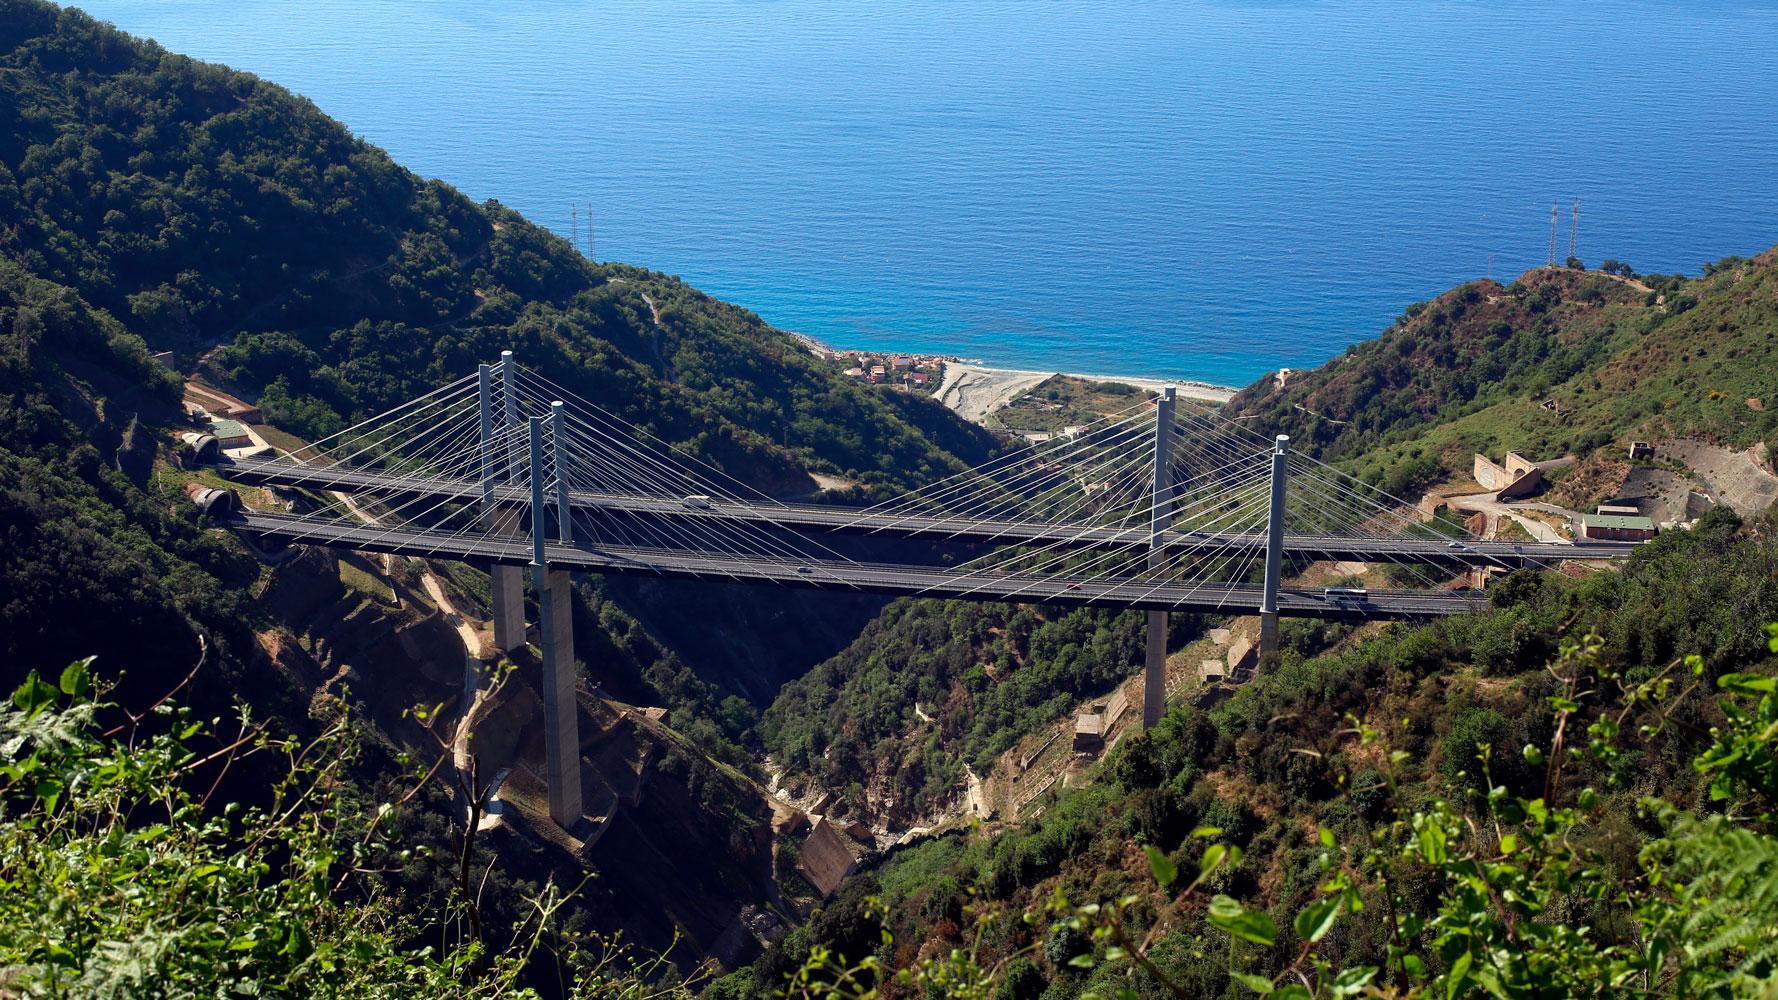 A2 Autostrada del Mediterraneo, viadotto Favazzina (Archivio storico Anas)